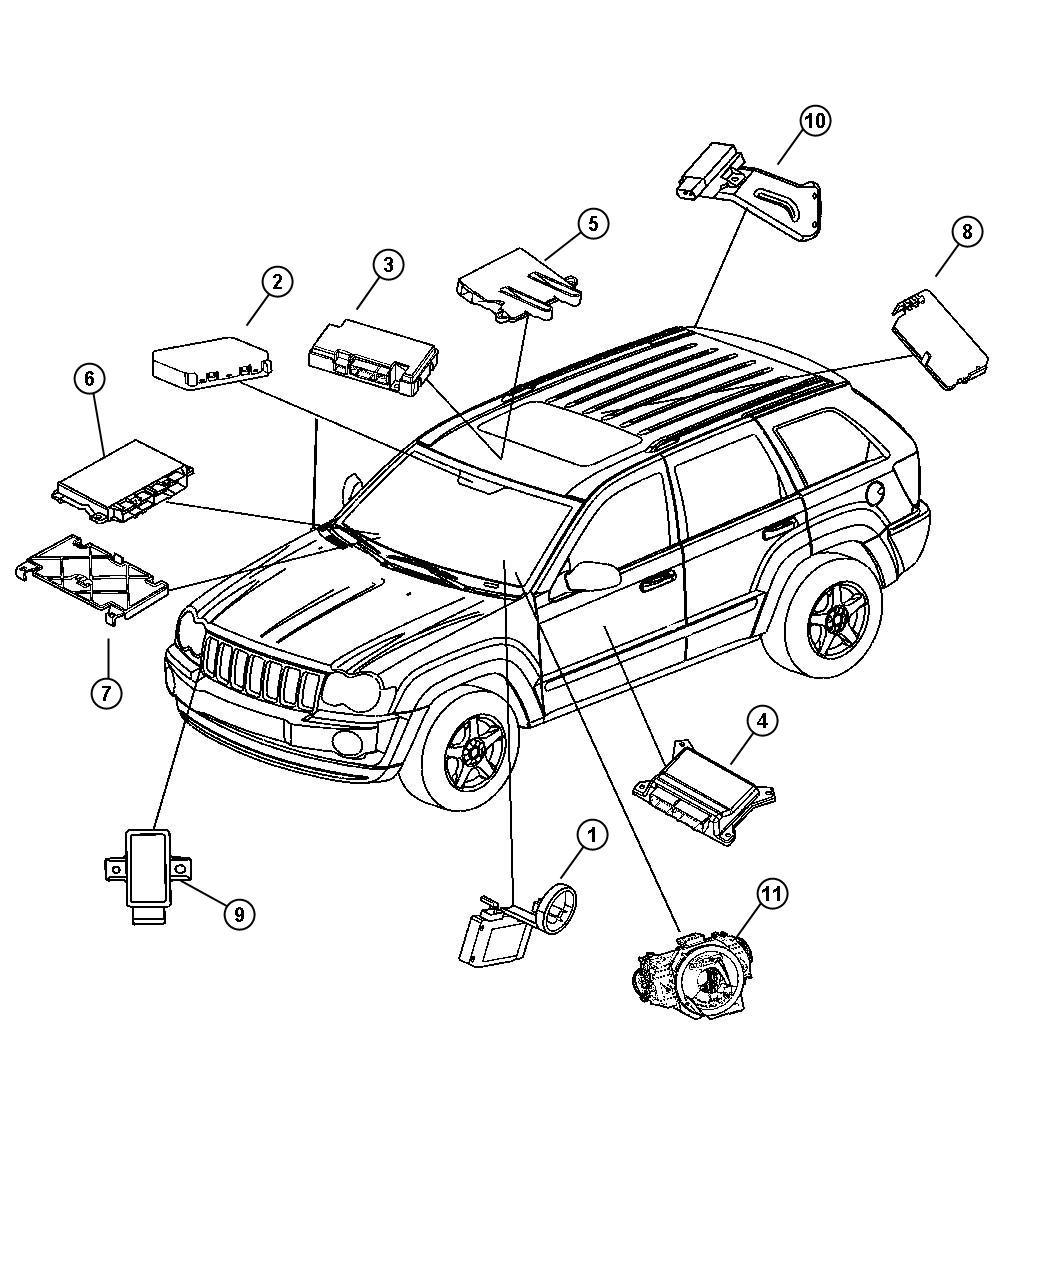 2007 Chrysler 300 Module. Rain sensor. Sensitive